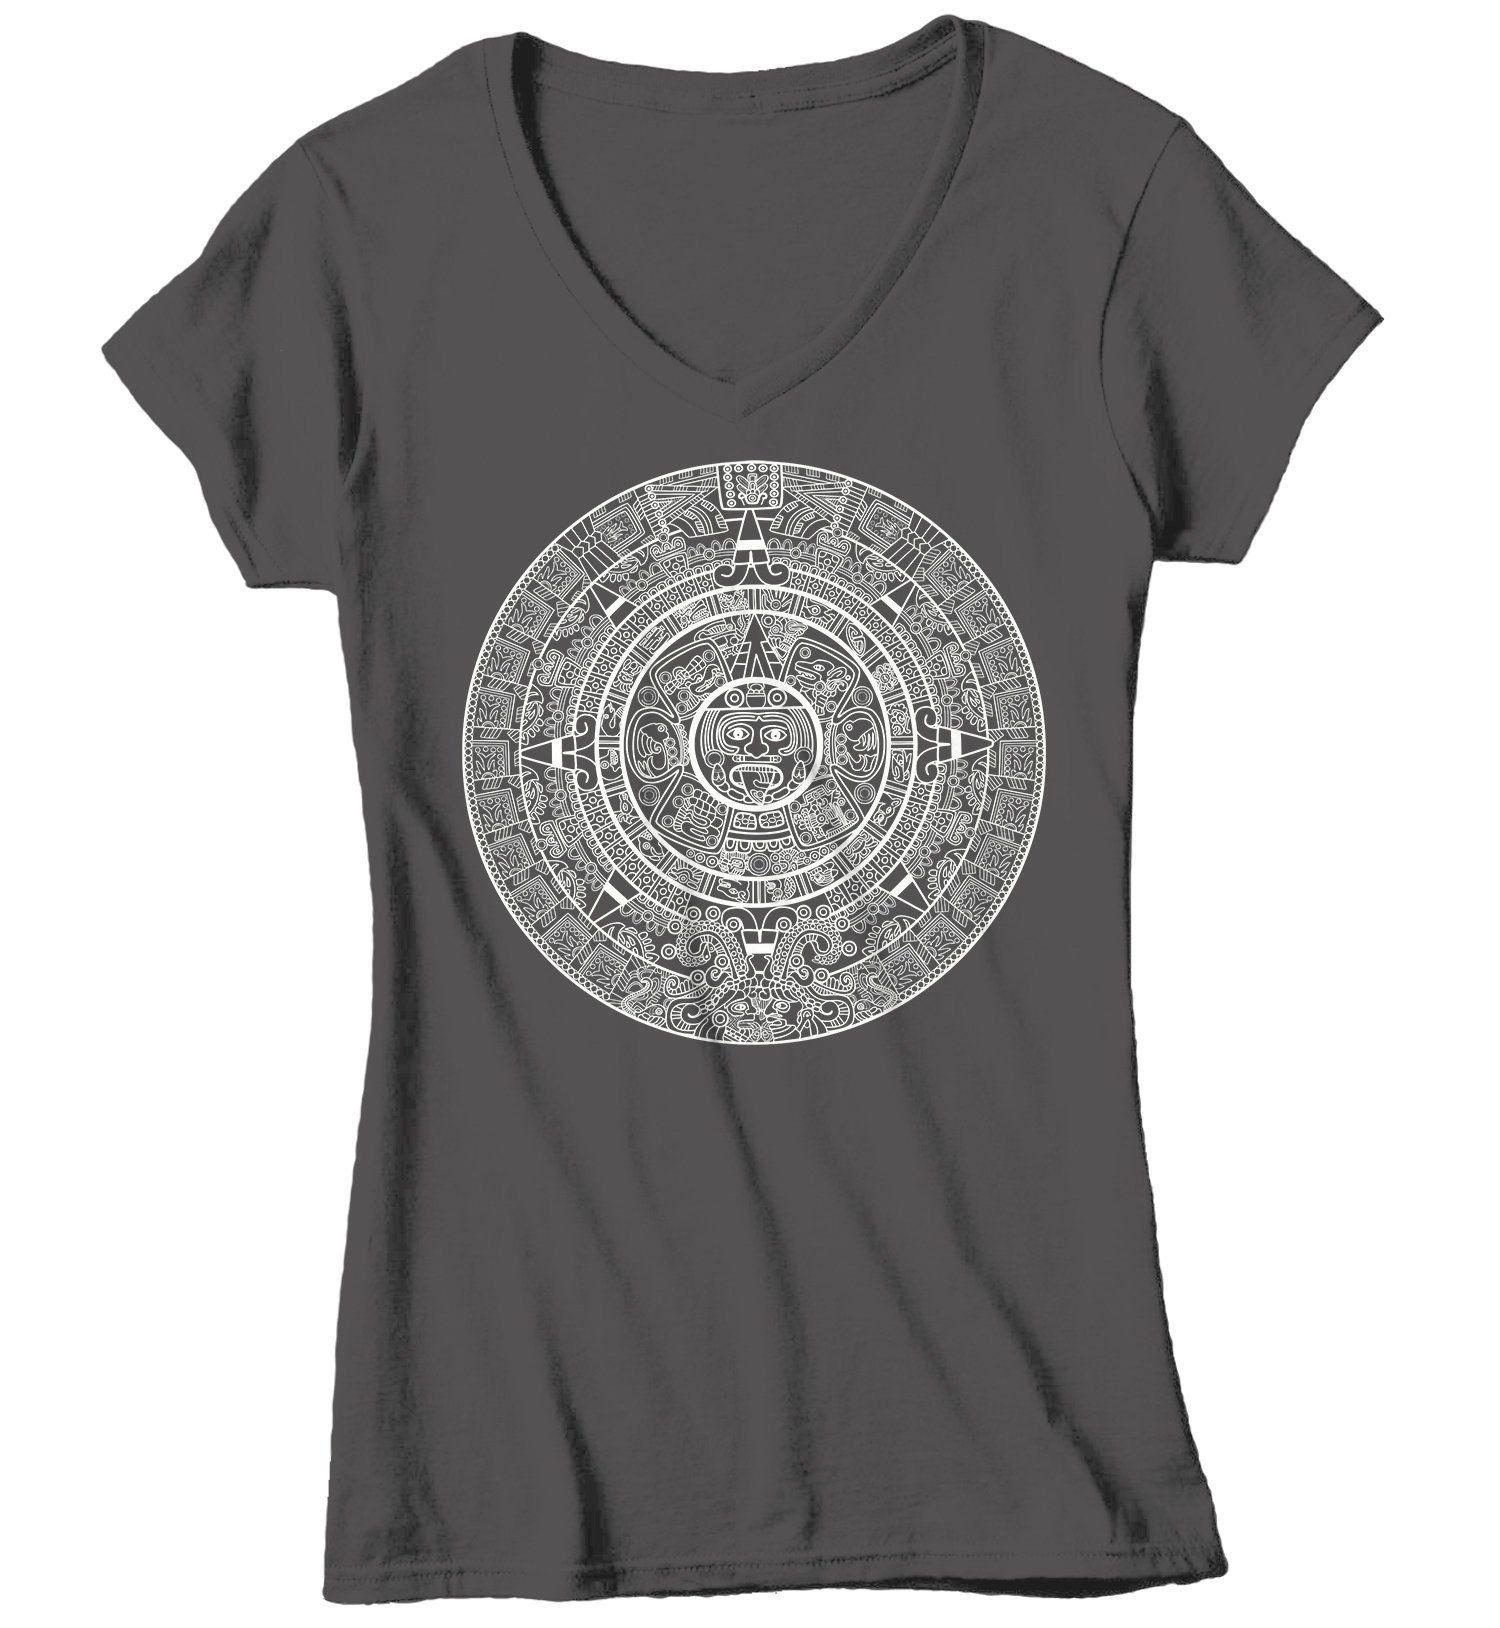 Ladies Aztec Calendar T-Shirt